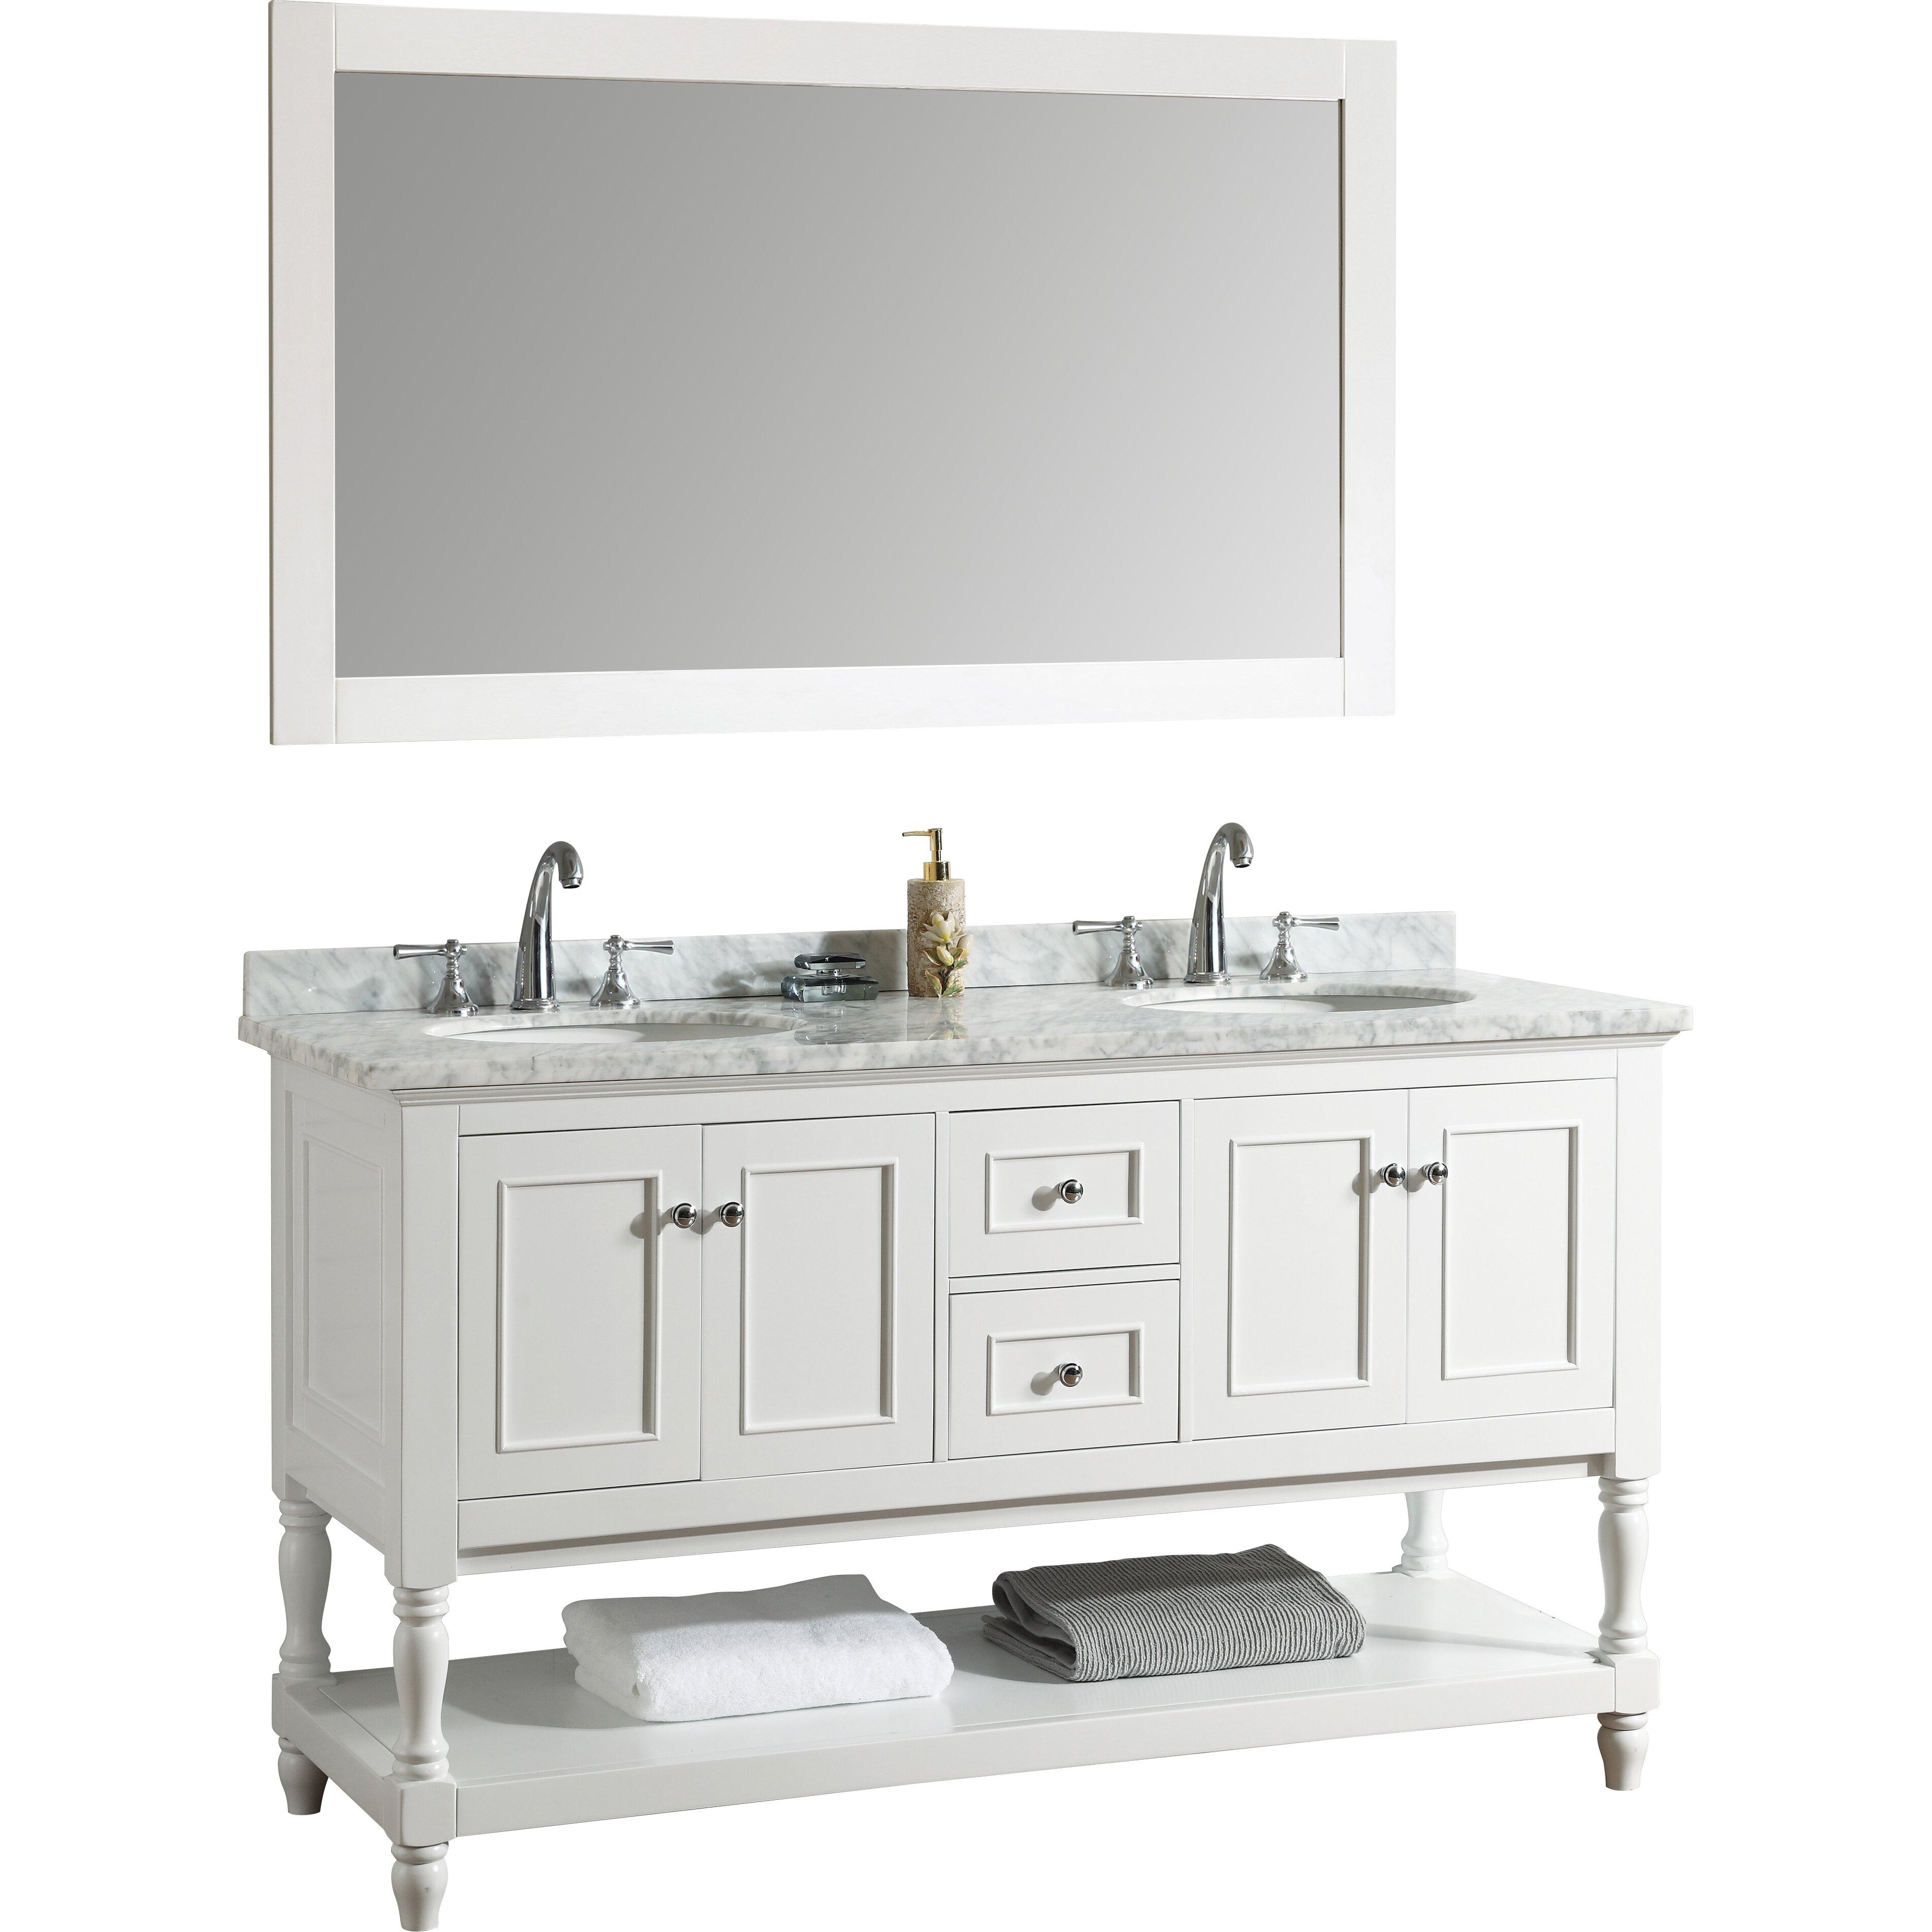 Palazzo 60-Inch Double Bathroom Vanity palazzo 60 inch bathroom vanity